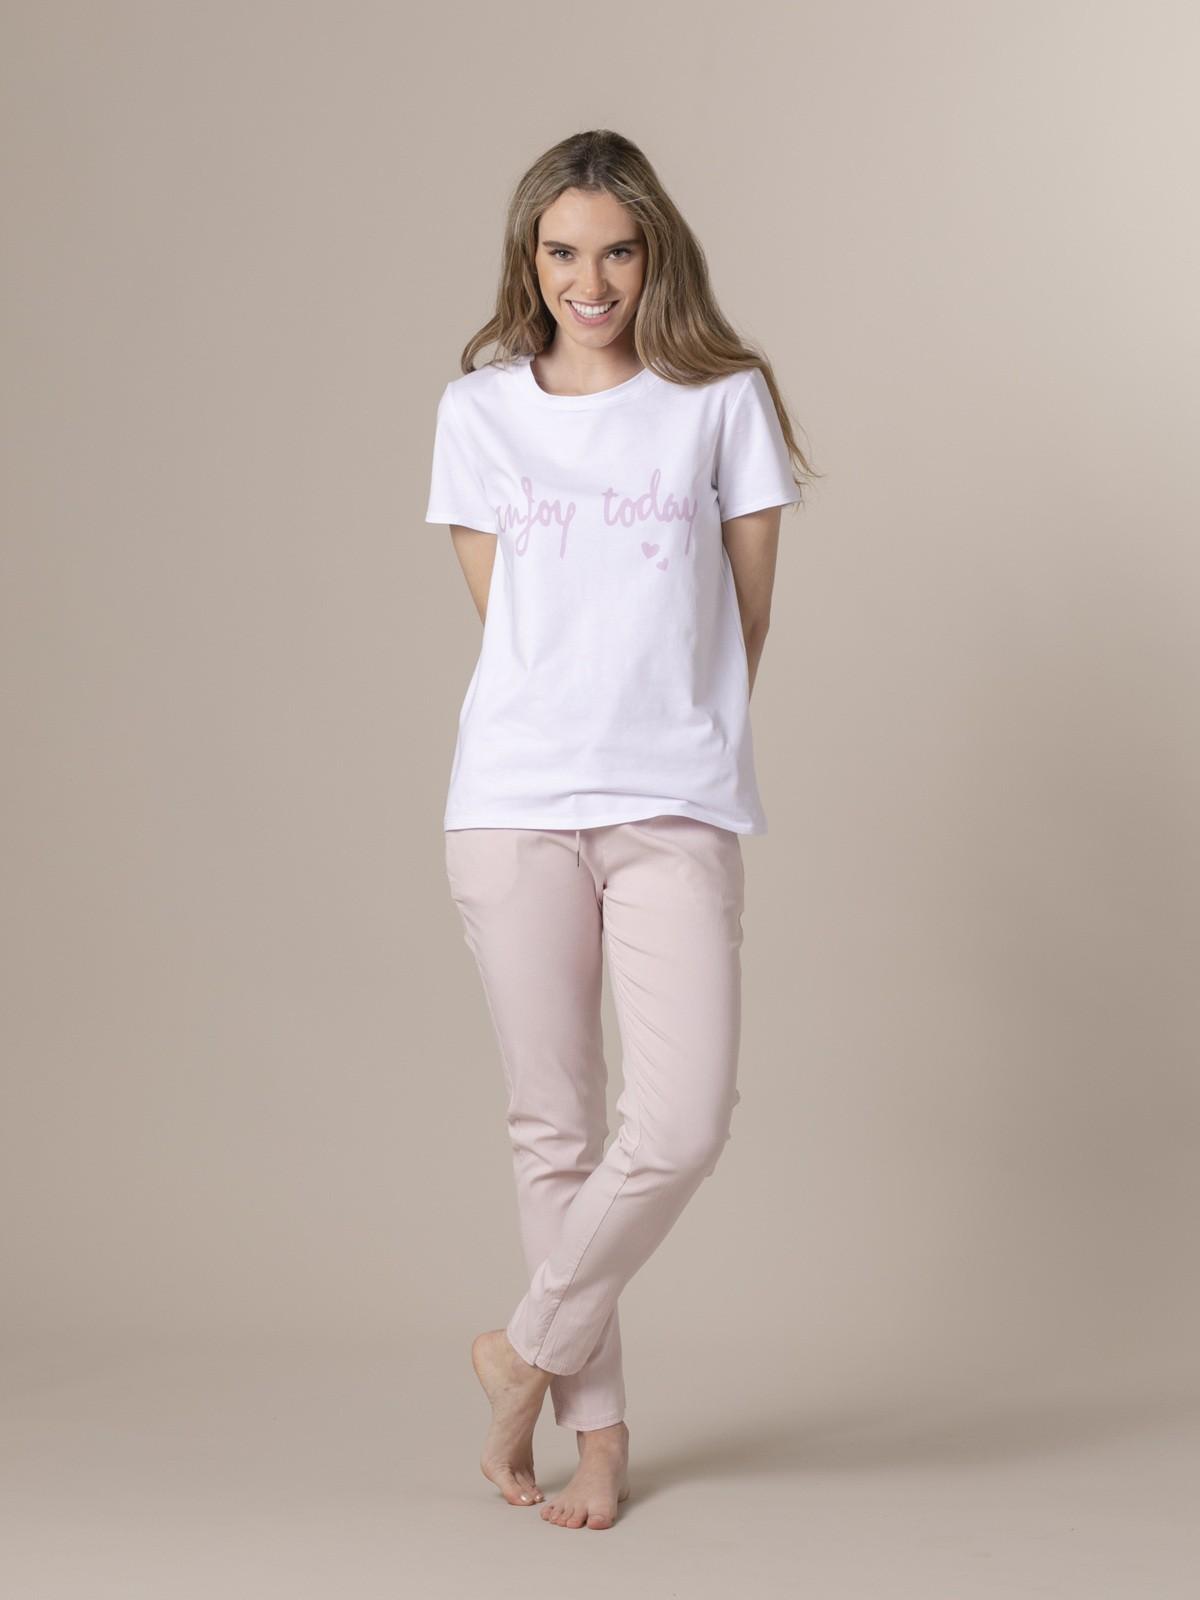 Camiseta mujer enjoy today Rosa